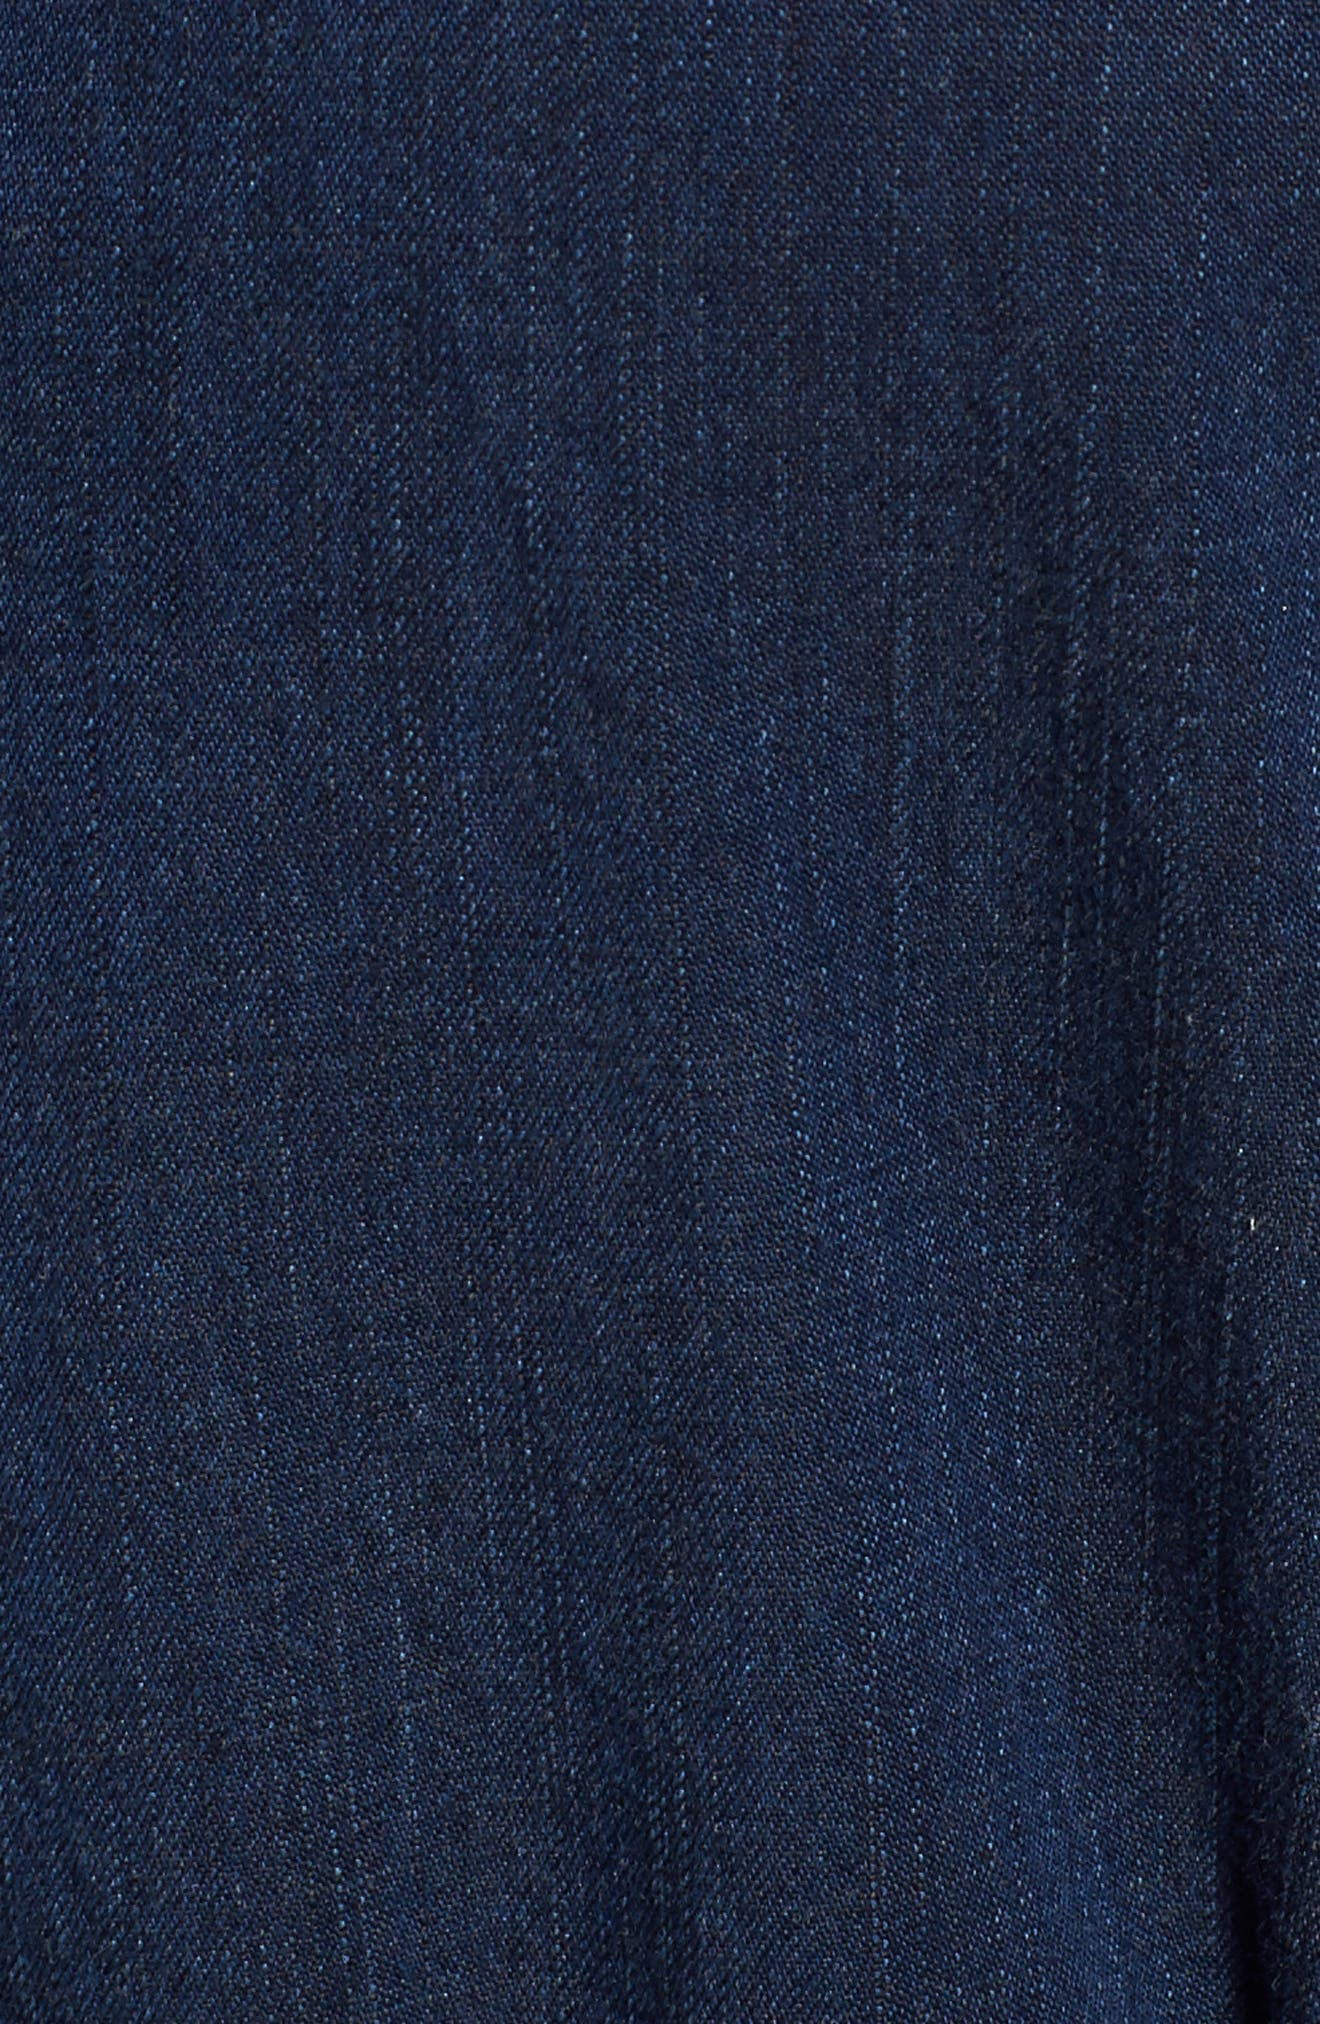 Denim Shirtdress,                             Alternate thumbnail 5, color,                             Midnight